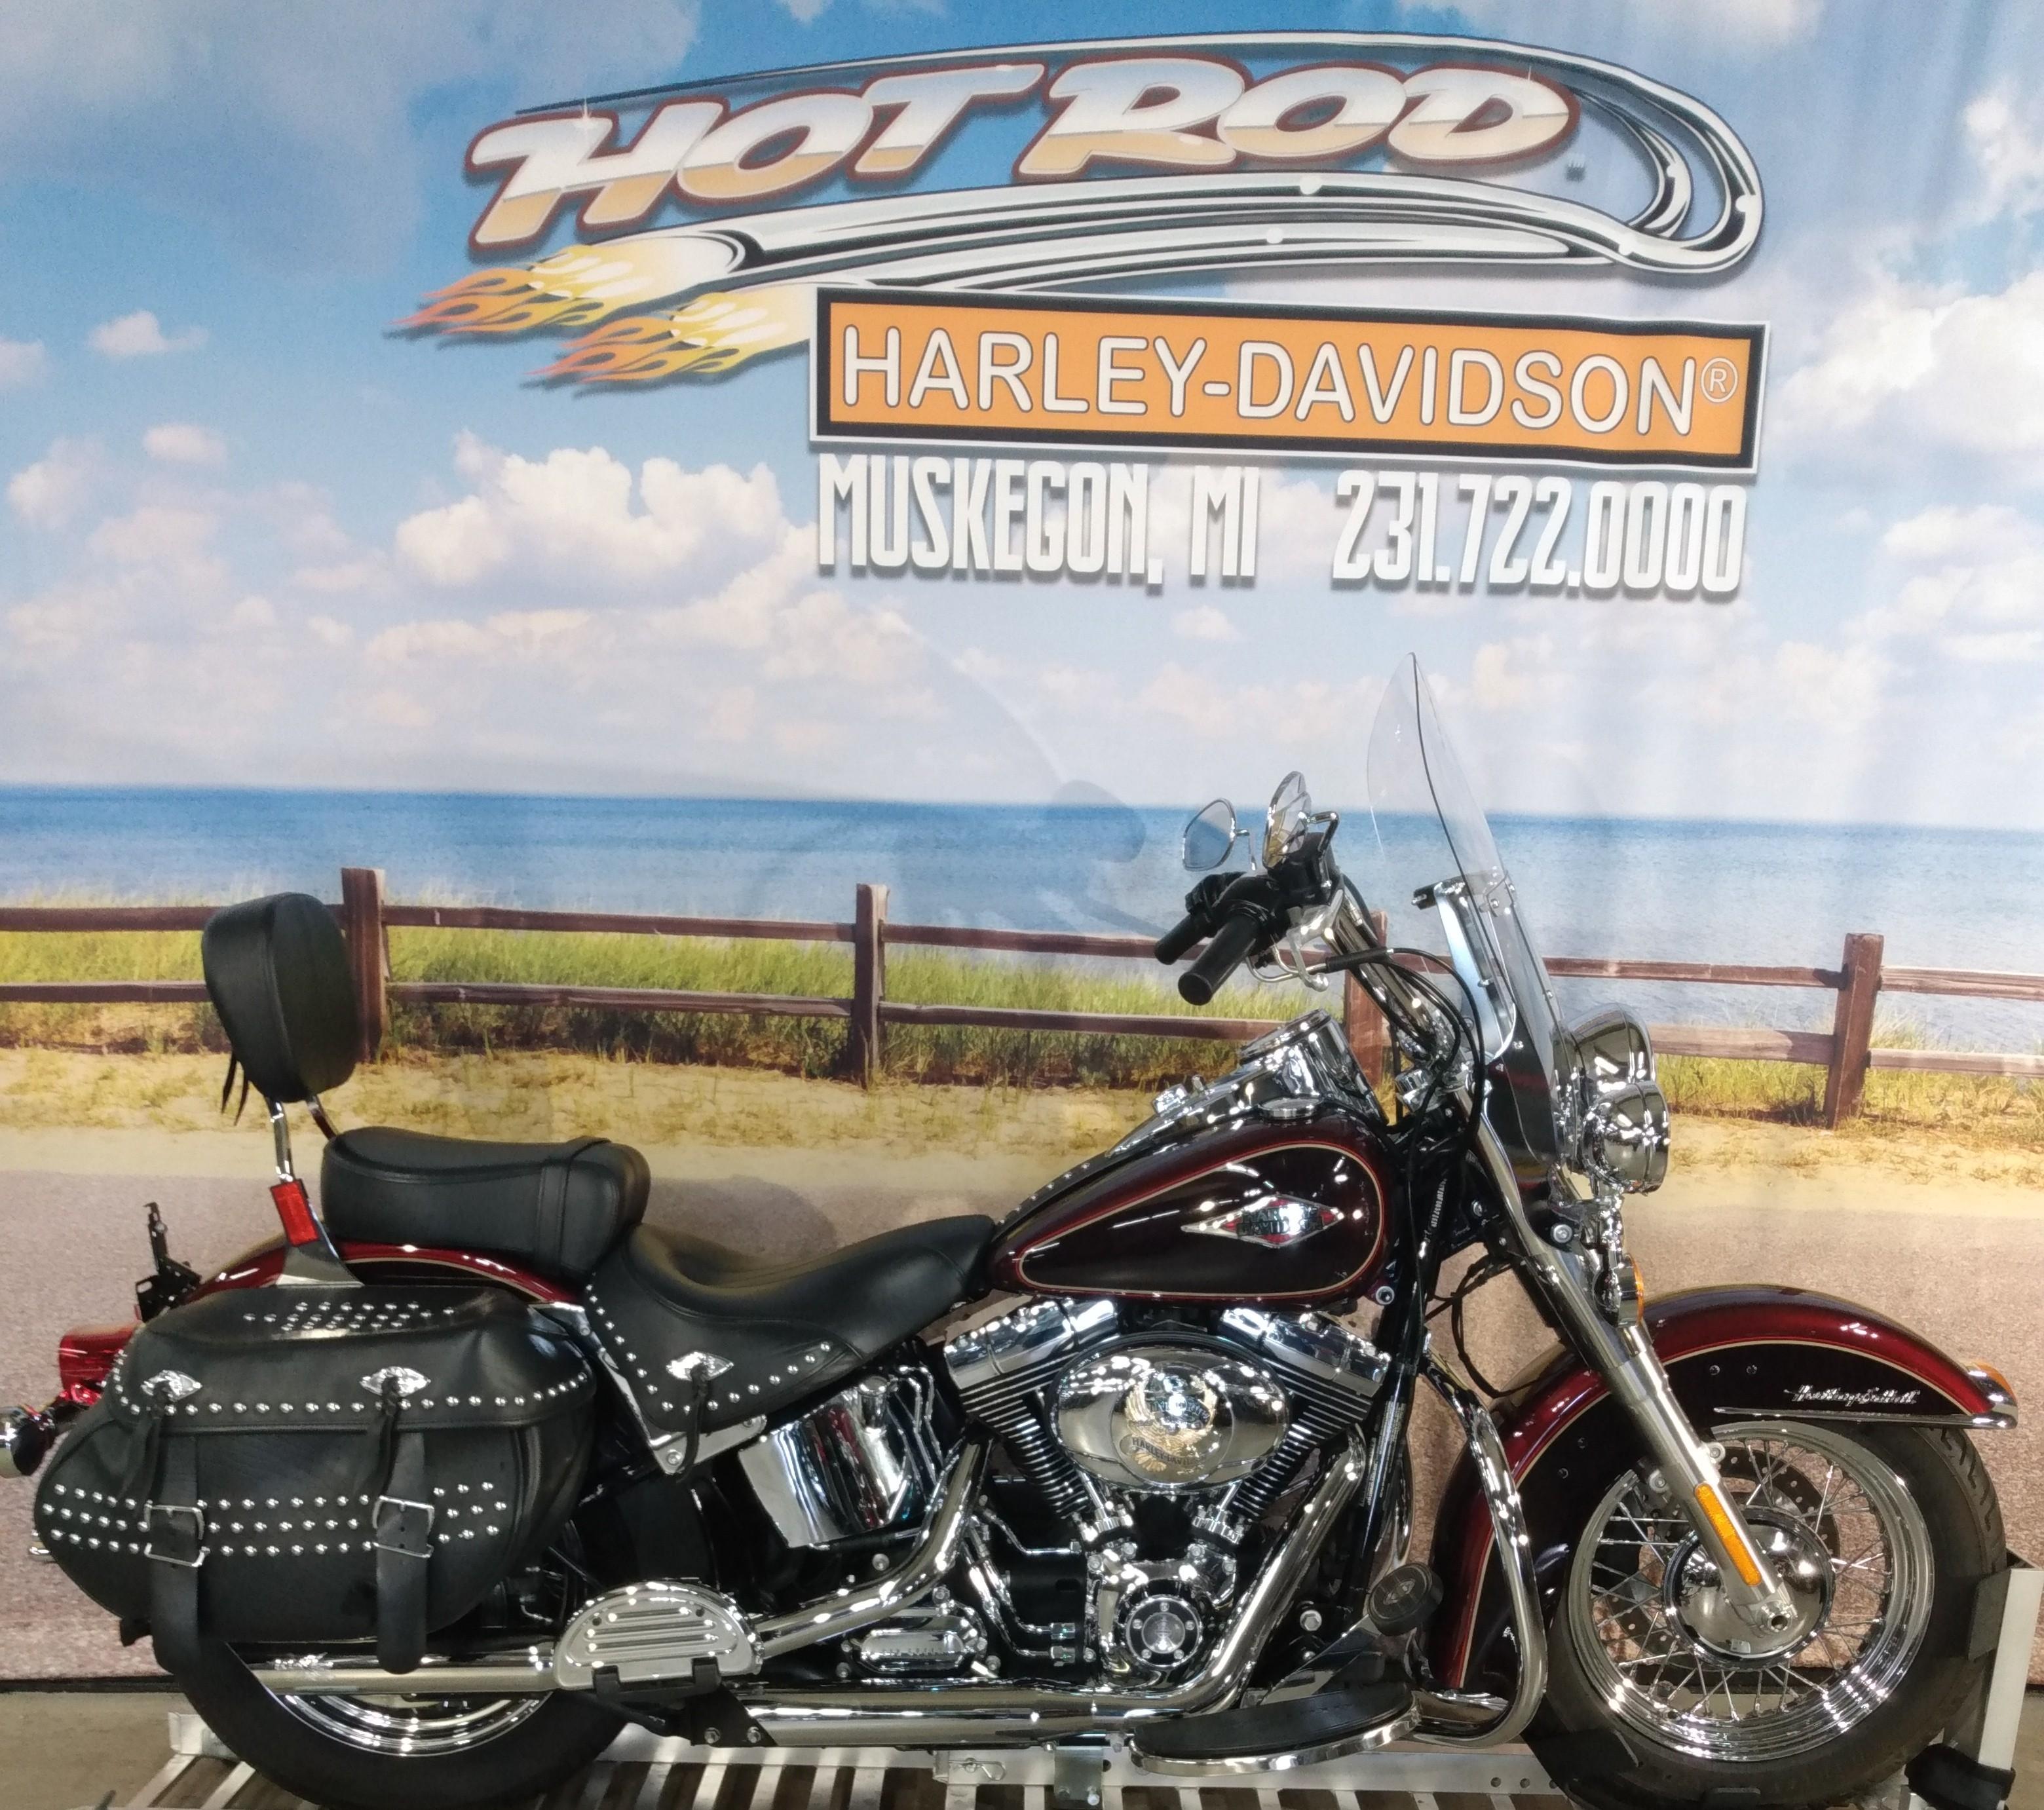 2015 Harley-Davidson Softail Heritage Softail Classic at Hot Rod Harley-Davidson